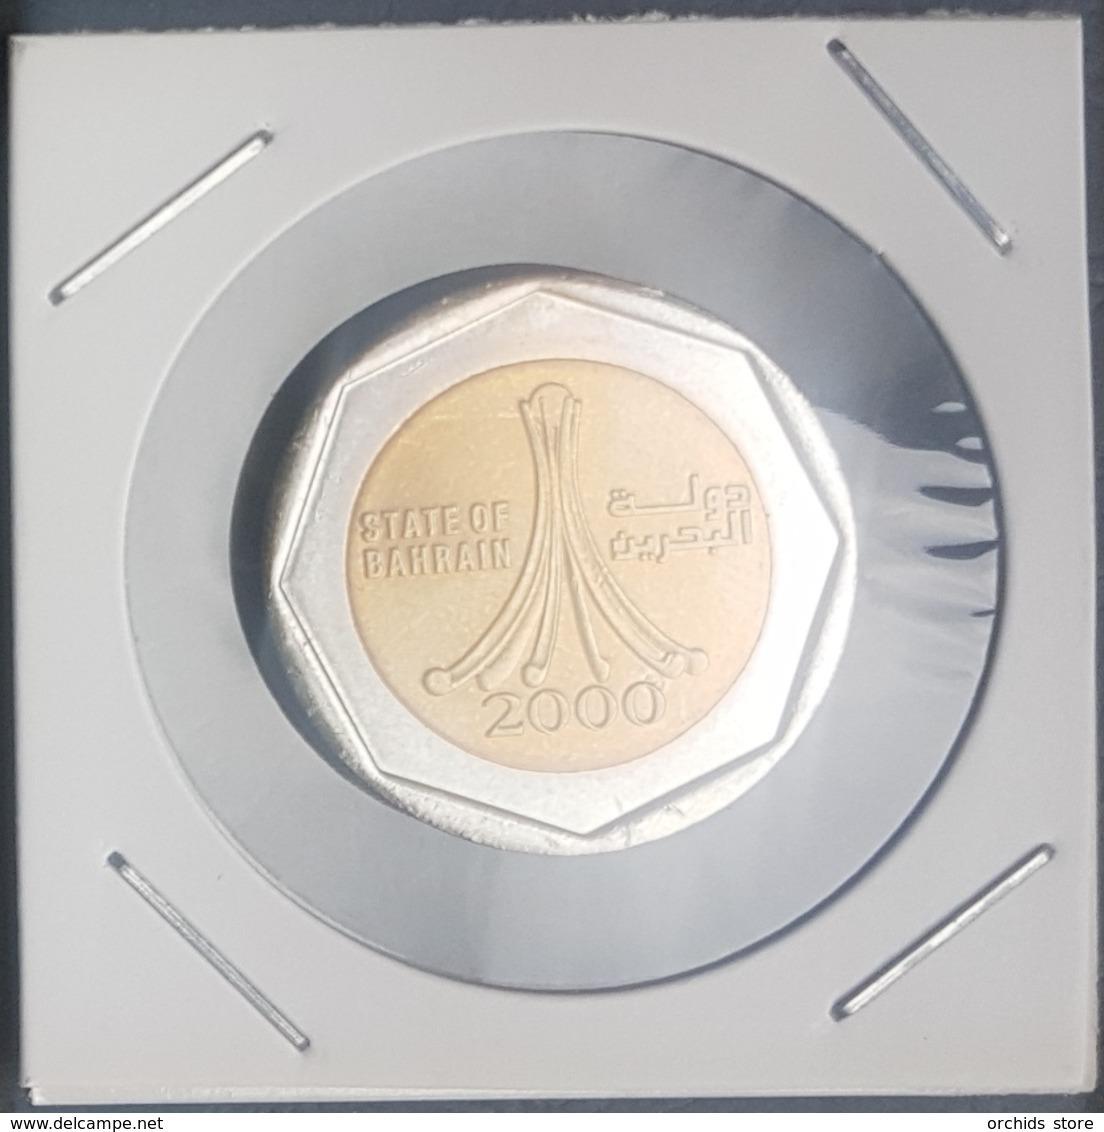 HX - Bahrain 2000 500 Fils Bimettalic Coin KM #22 - State Coat Of Arms - A-UNC / UNC - Bahrein